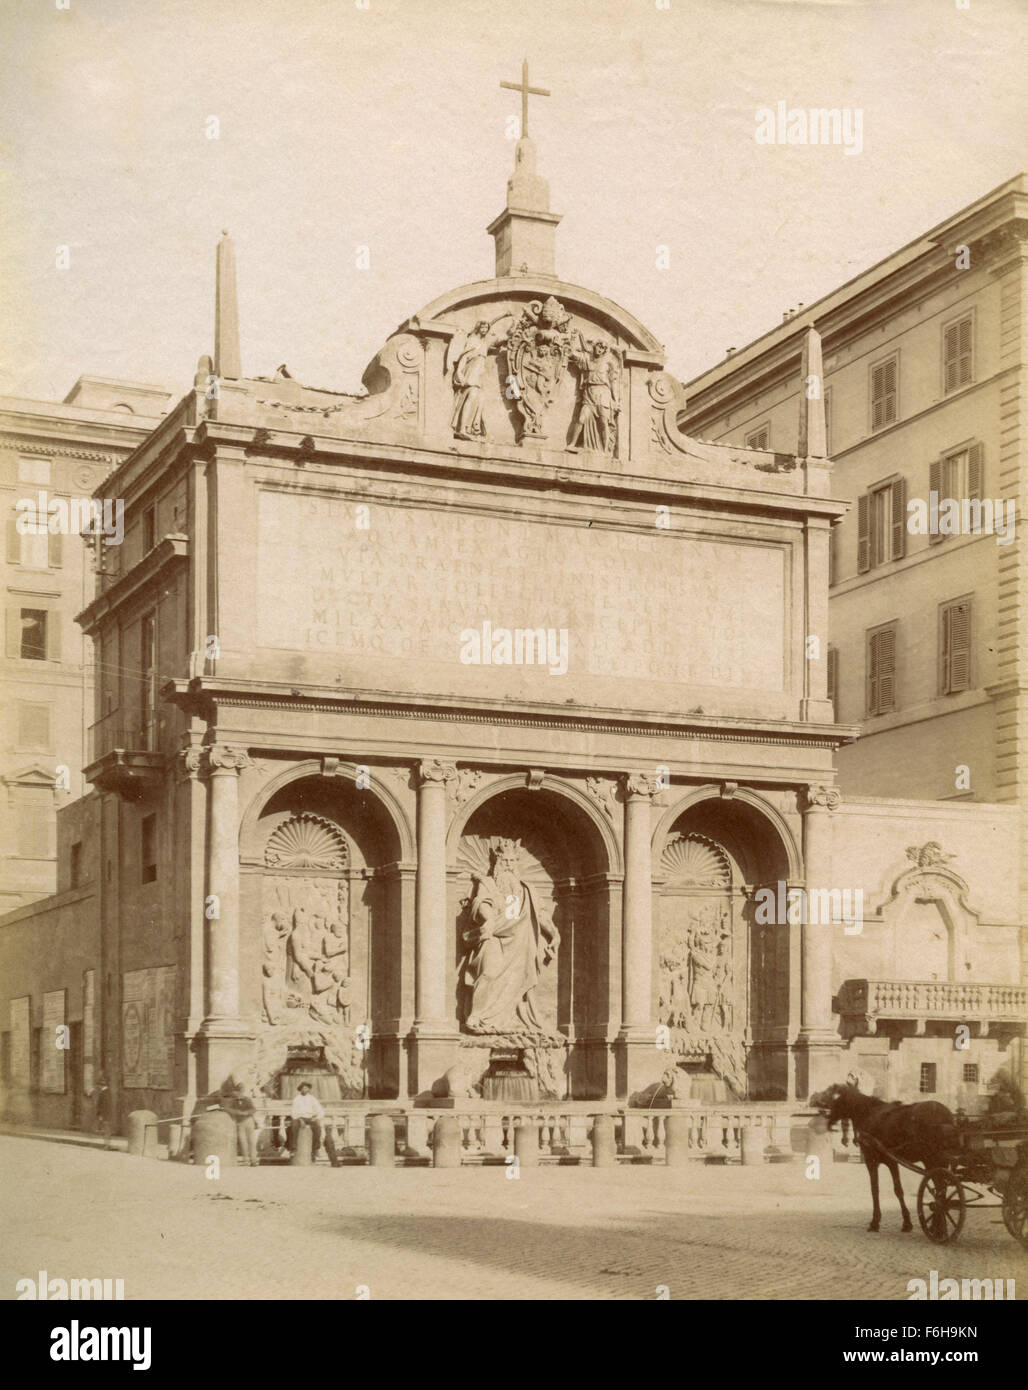 Acqua Felice Fountain, Rome, Italy - Stock Image